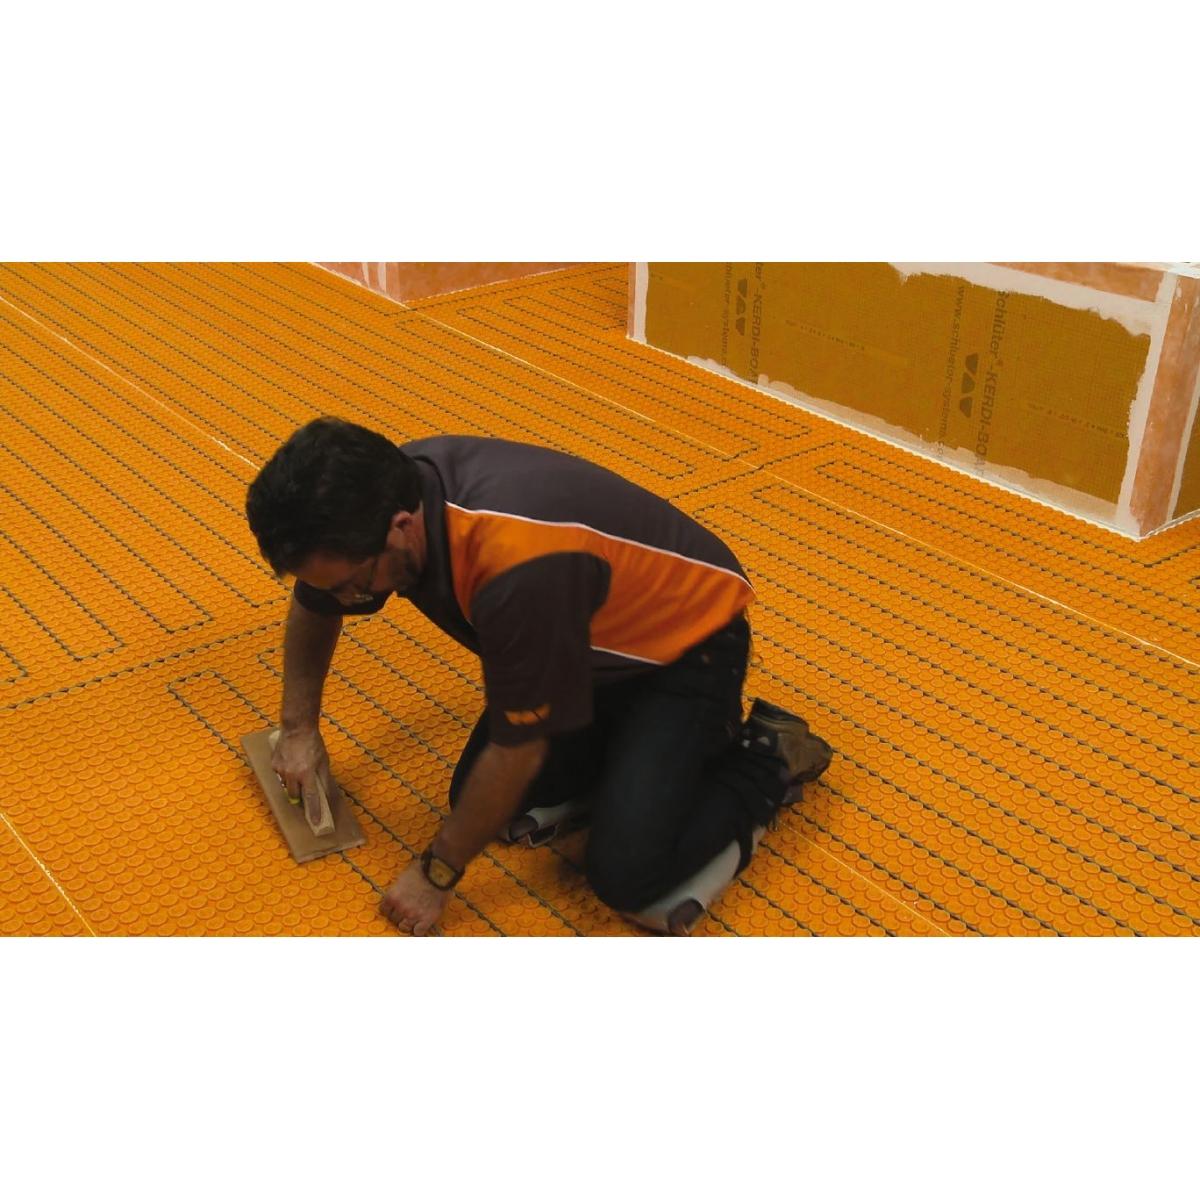 Kit de suelo radiante con termostato táctil con aislamiento bajo lámina Suelo radiante eléctrico